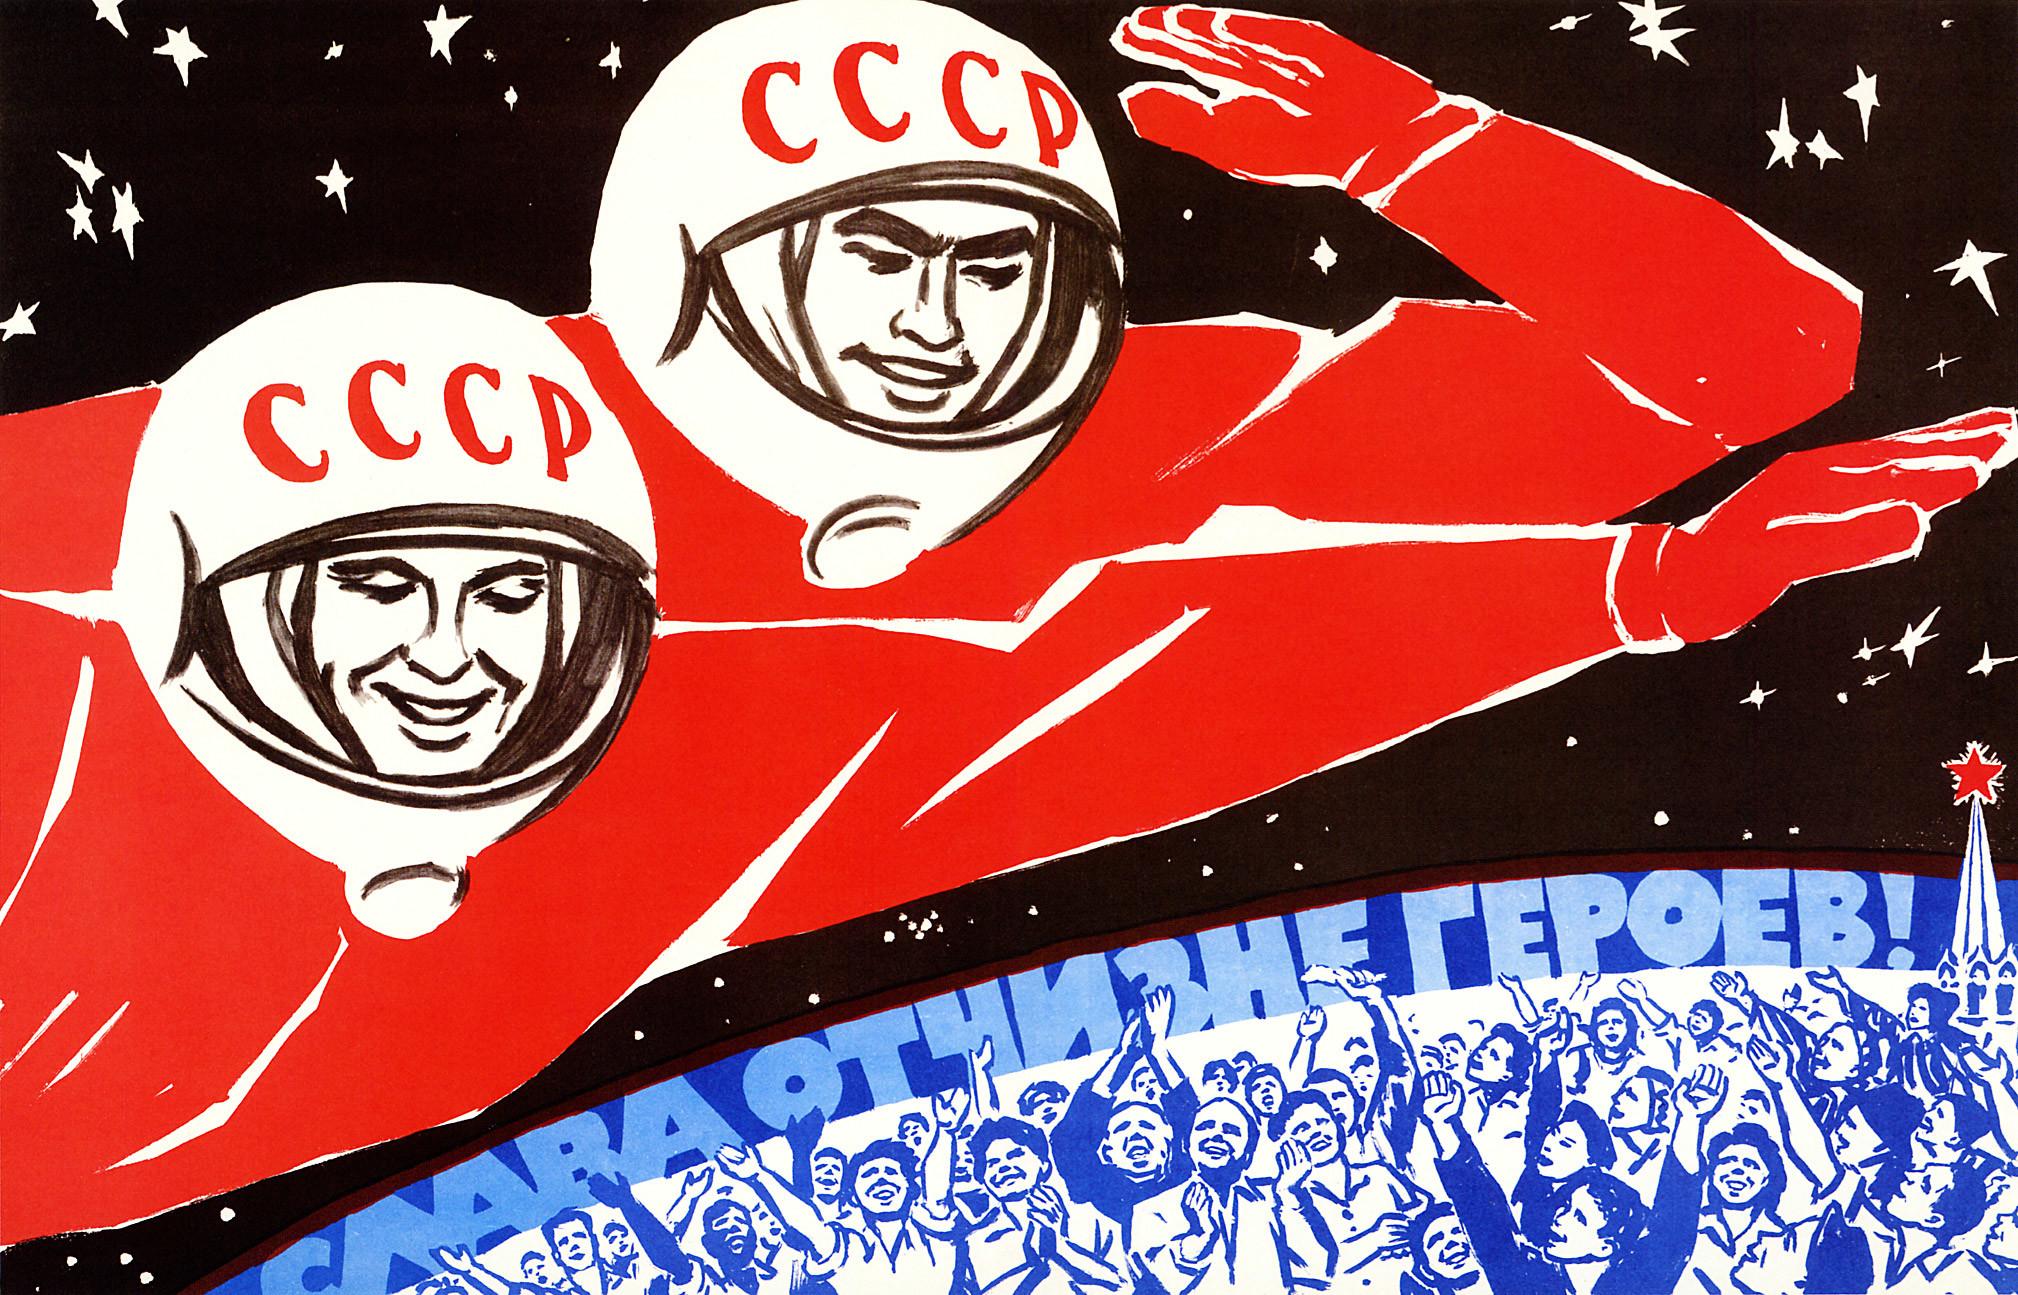 1920x1200 Soviet Union Propaganda